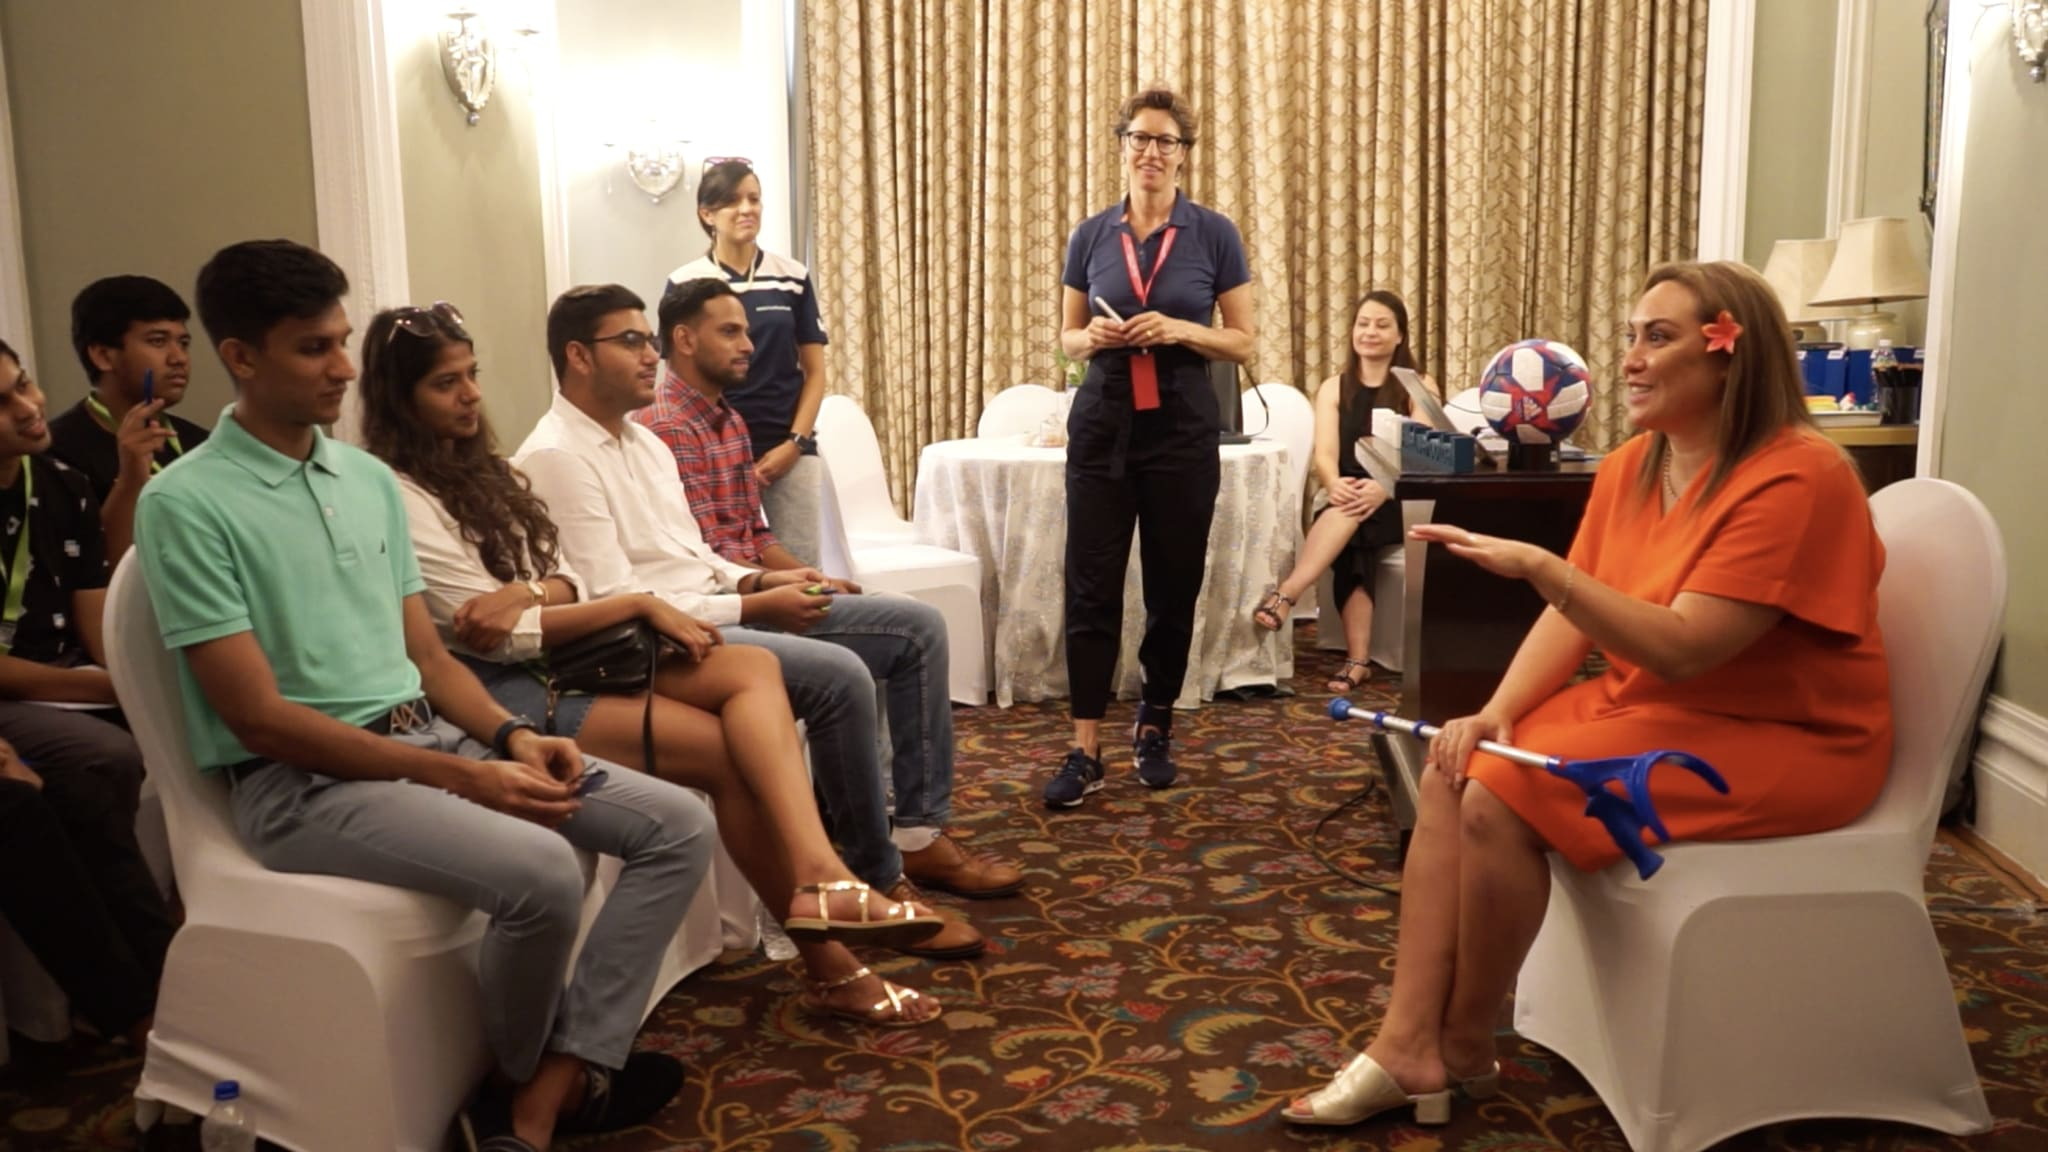 FIFA Fan Movement members interview Sarai Bareman, FIFA's Chief Women's Football Officer, in Mumbai, India.